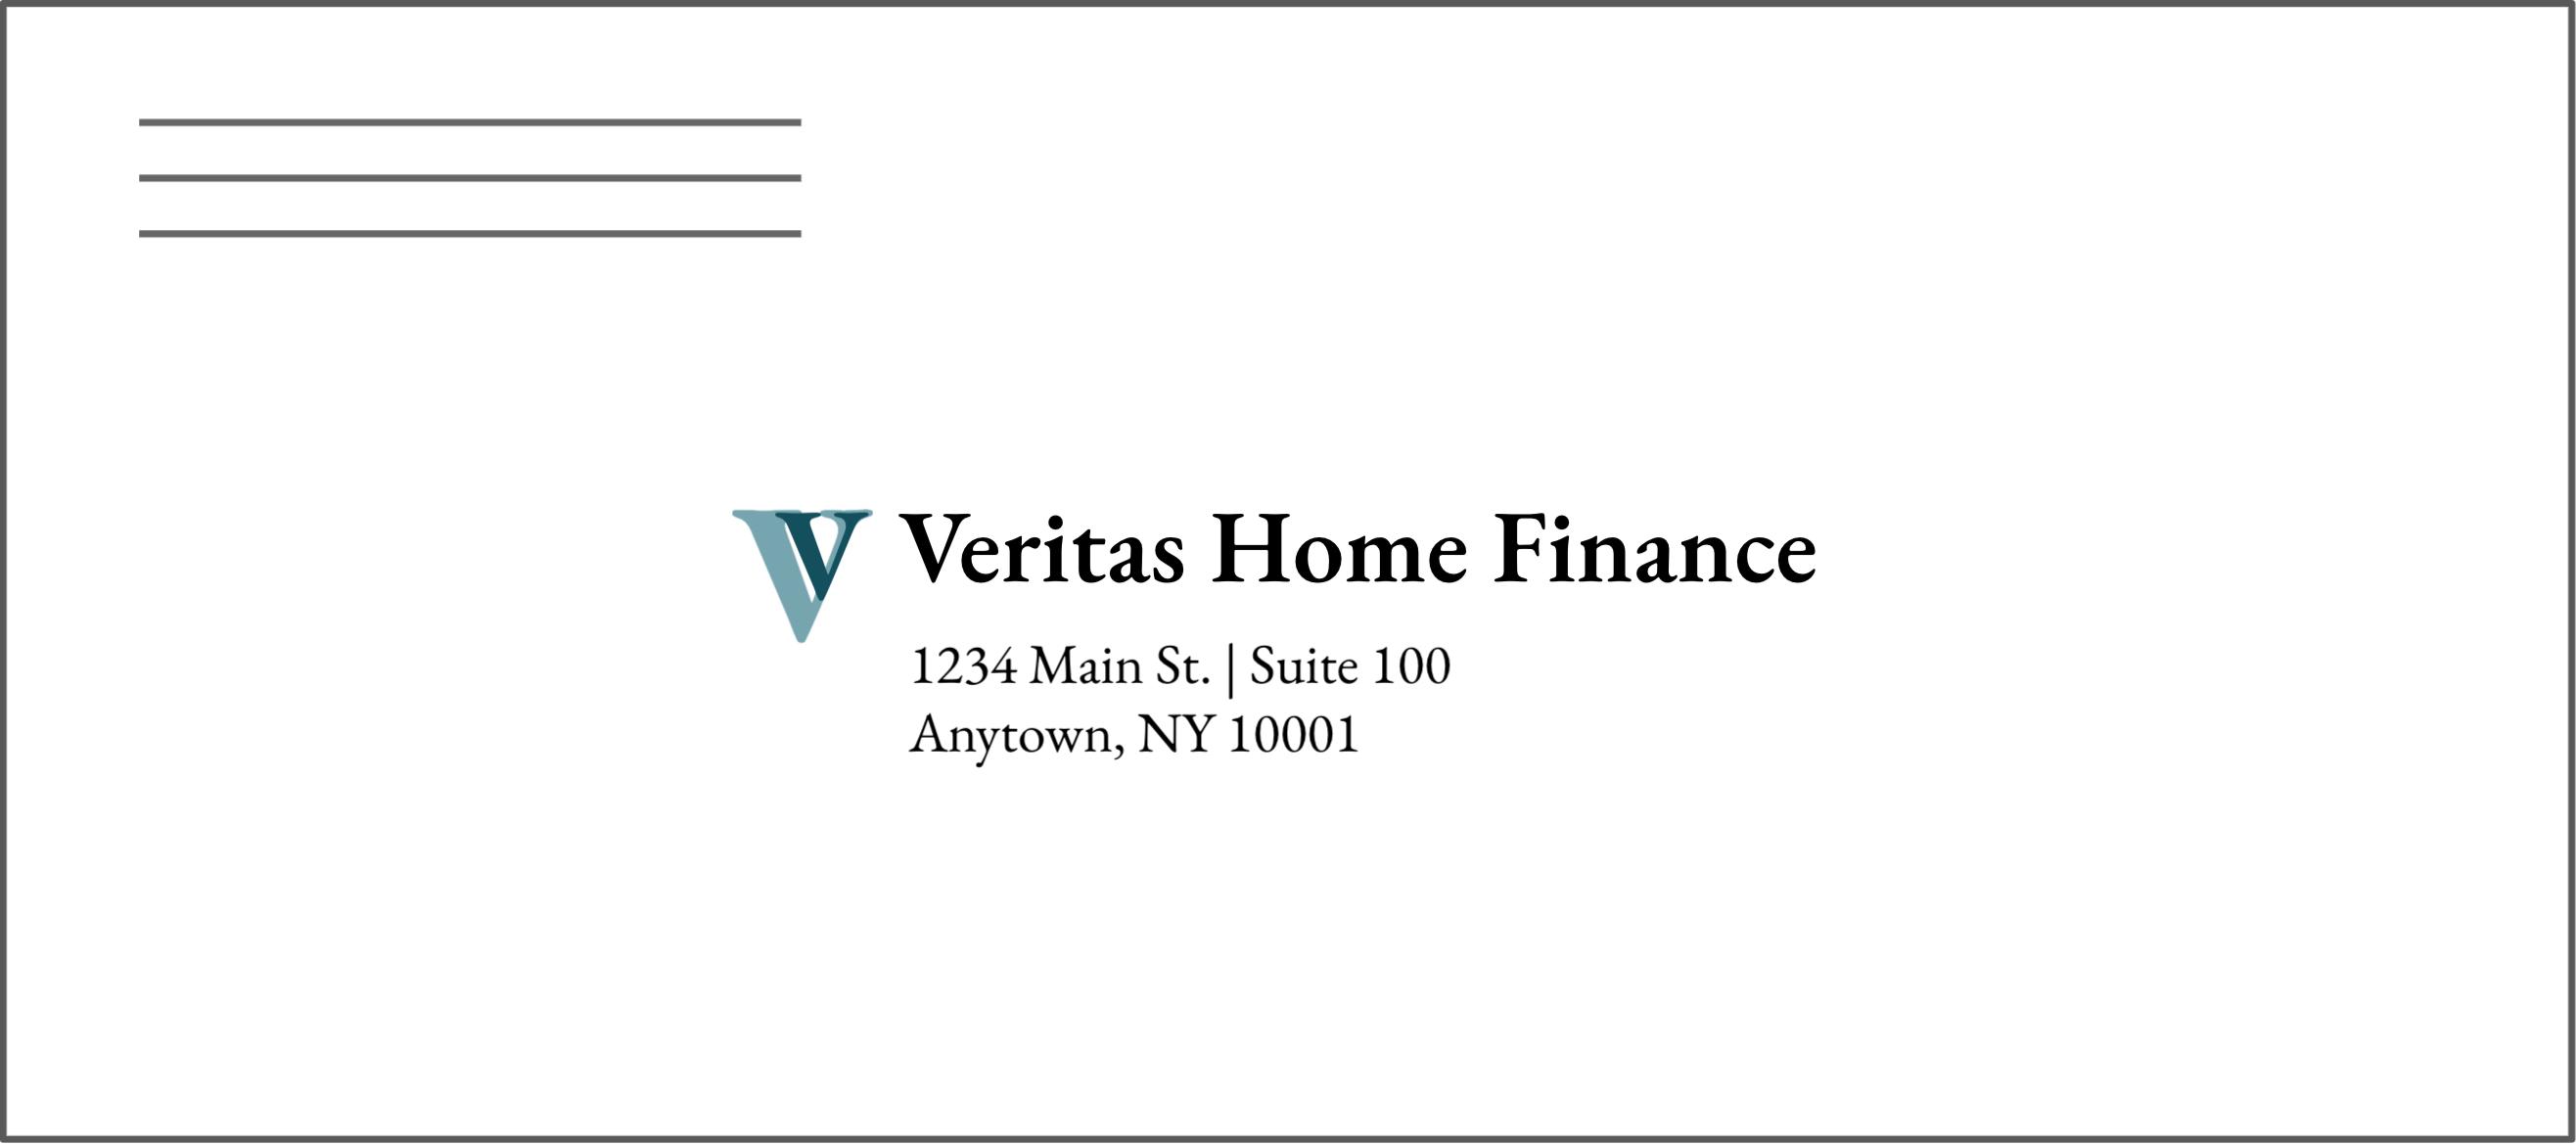 Home Financing Return Envelope